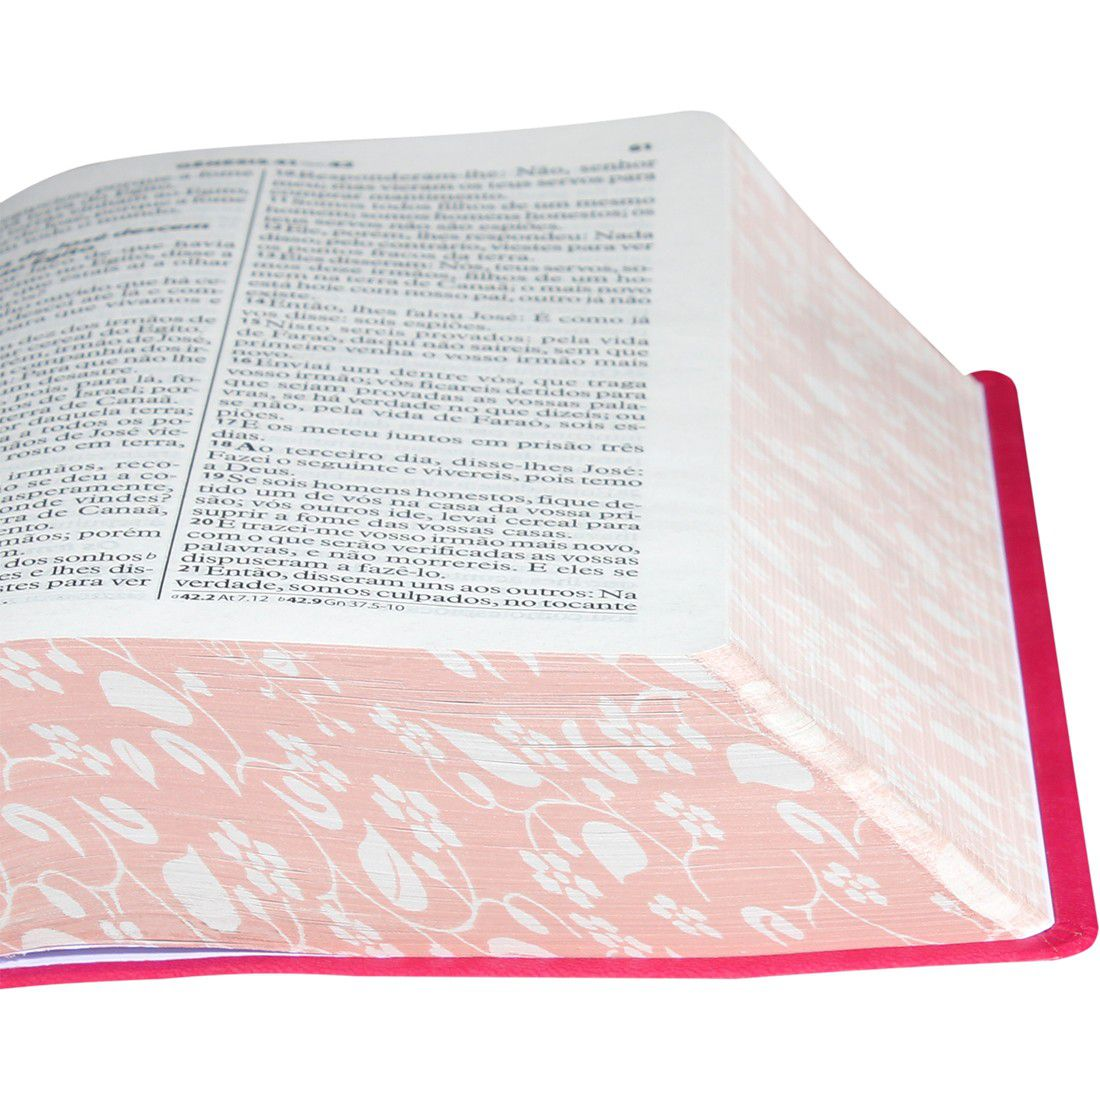 Bíblia Letra Gigante RA SBB (Pink Floral)  - Livraria Betel